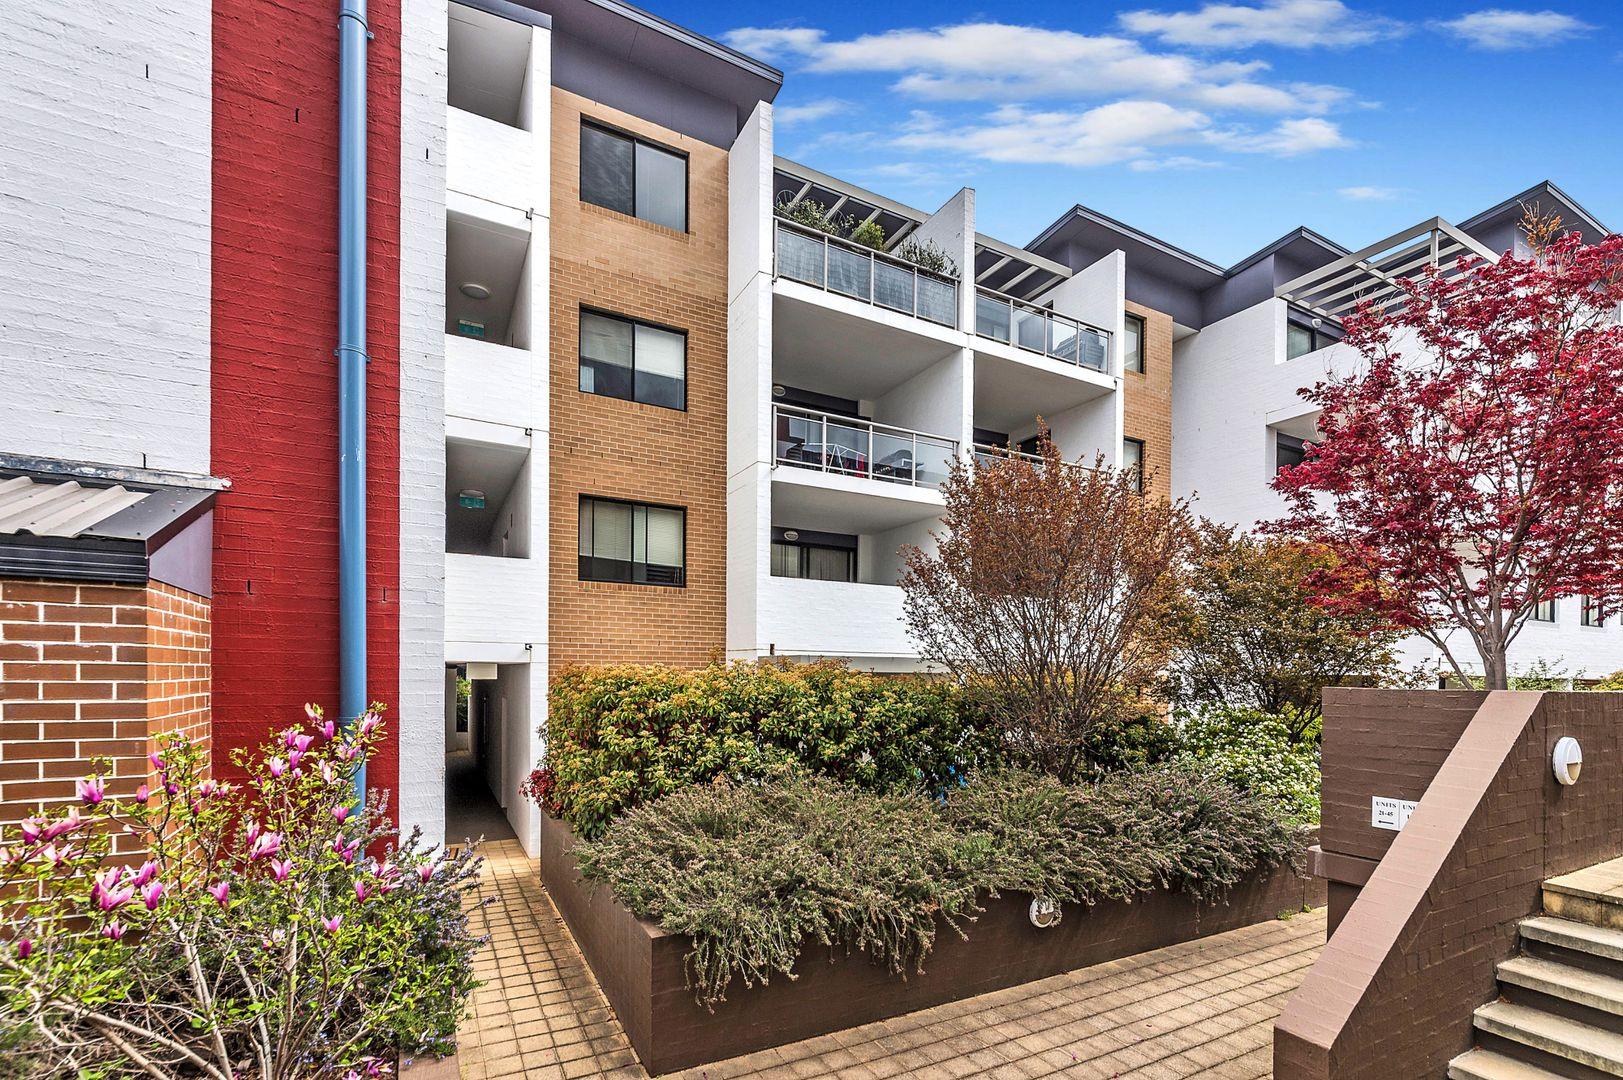 26/3a Stornaway Road, Queanbeyan NSW 2620, Image 0